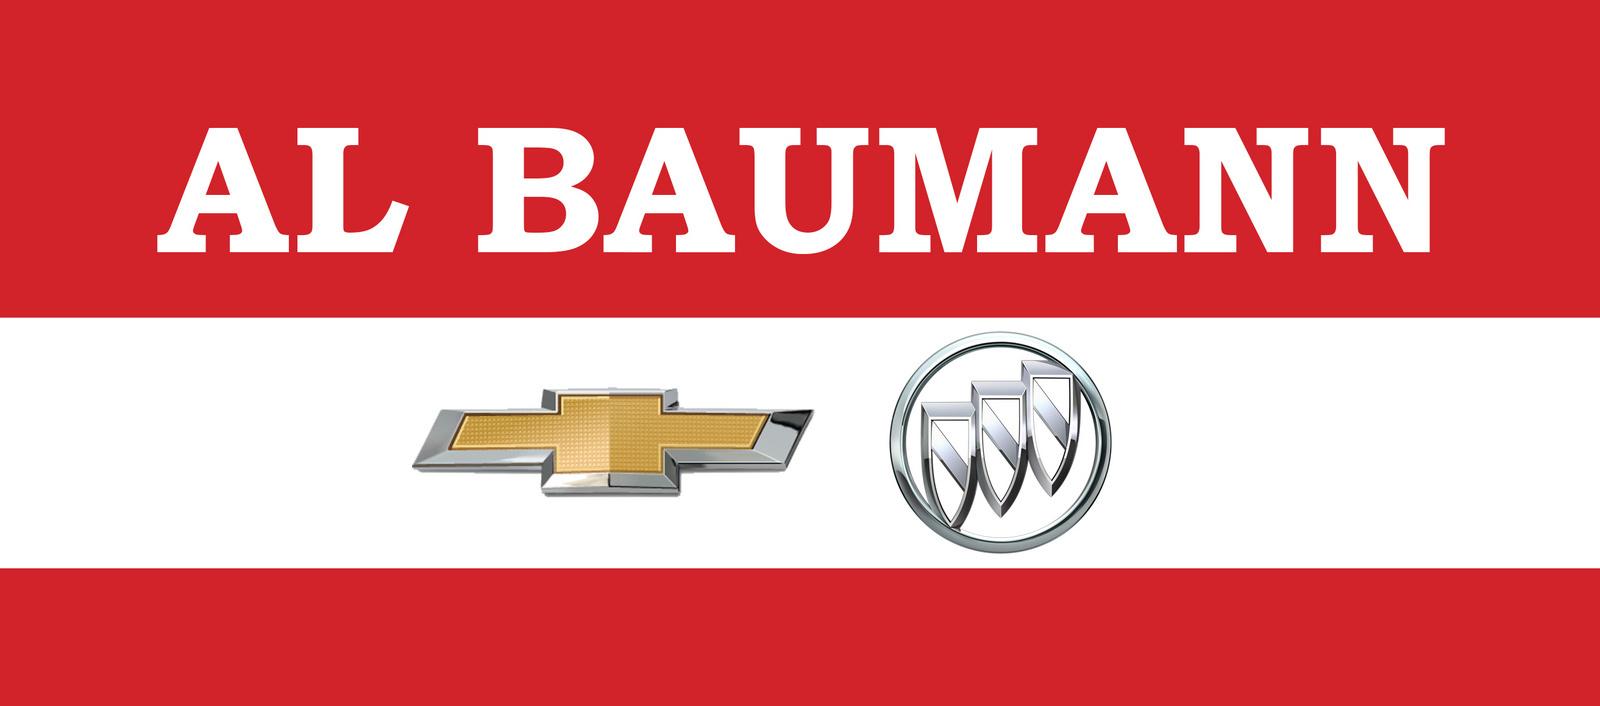 Al Baumann Chevrolet Buick Fremont Oh Read Consumer